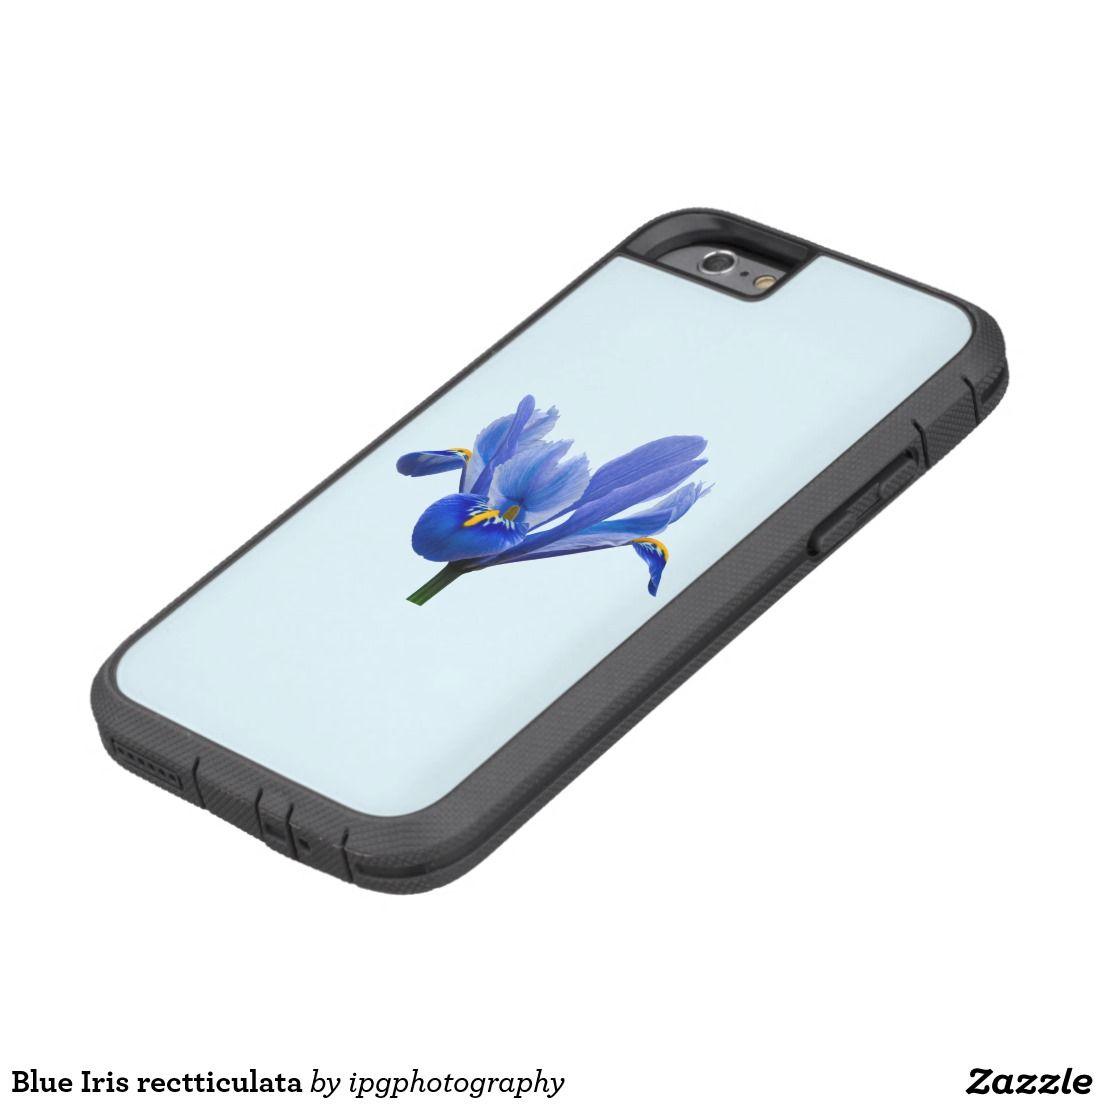 Blue iris rectticulata tough xtreme iphone 6 case this floral design blue iris rectticulata tough xtreme iphone 6 case this floral design features a flower of the izmirmasajfo